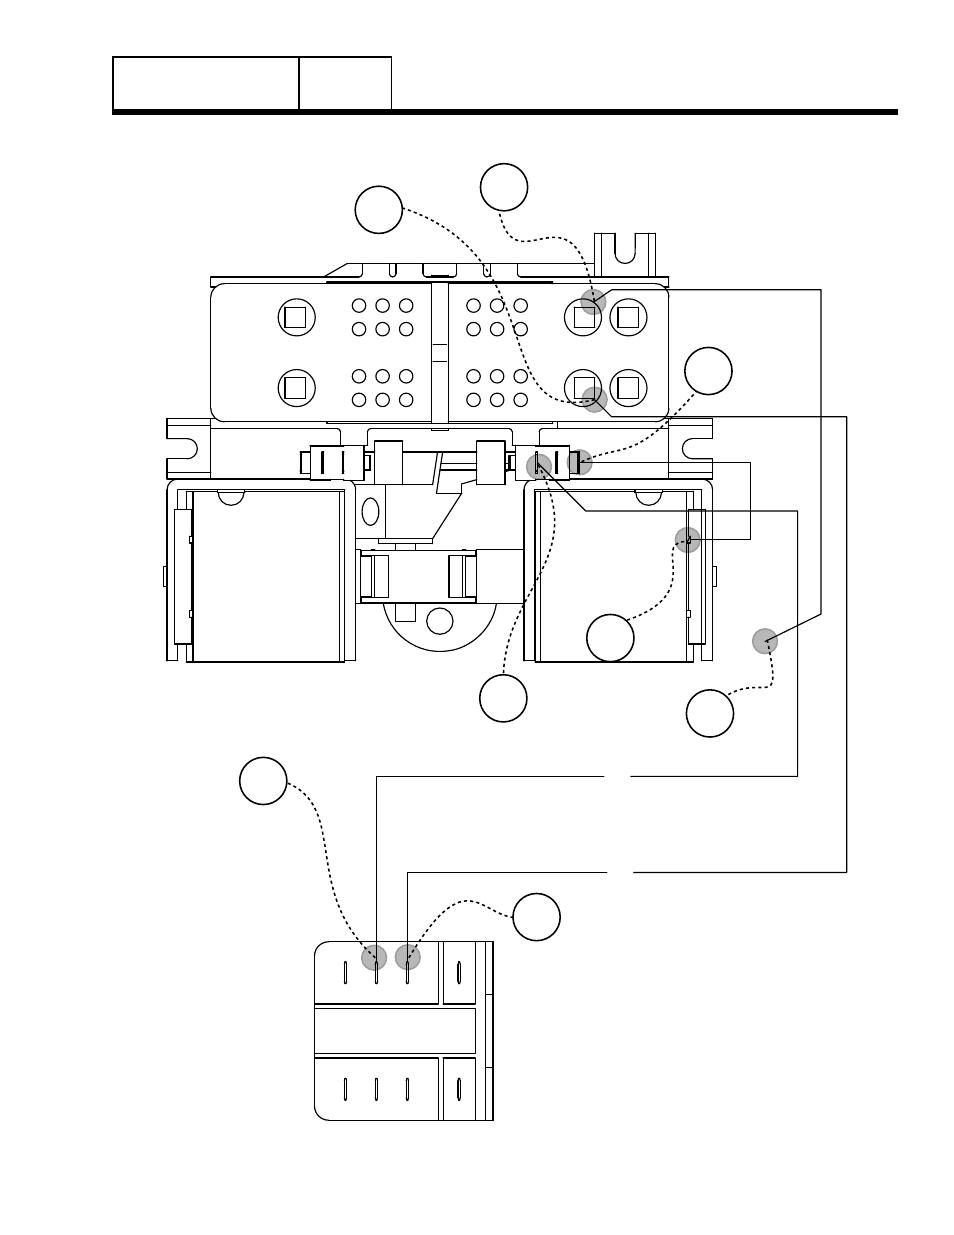 wiring diagram for generac 16 kw  columbia wiring diagram